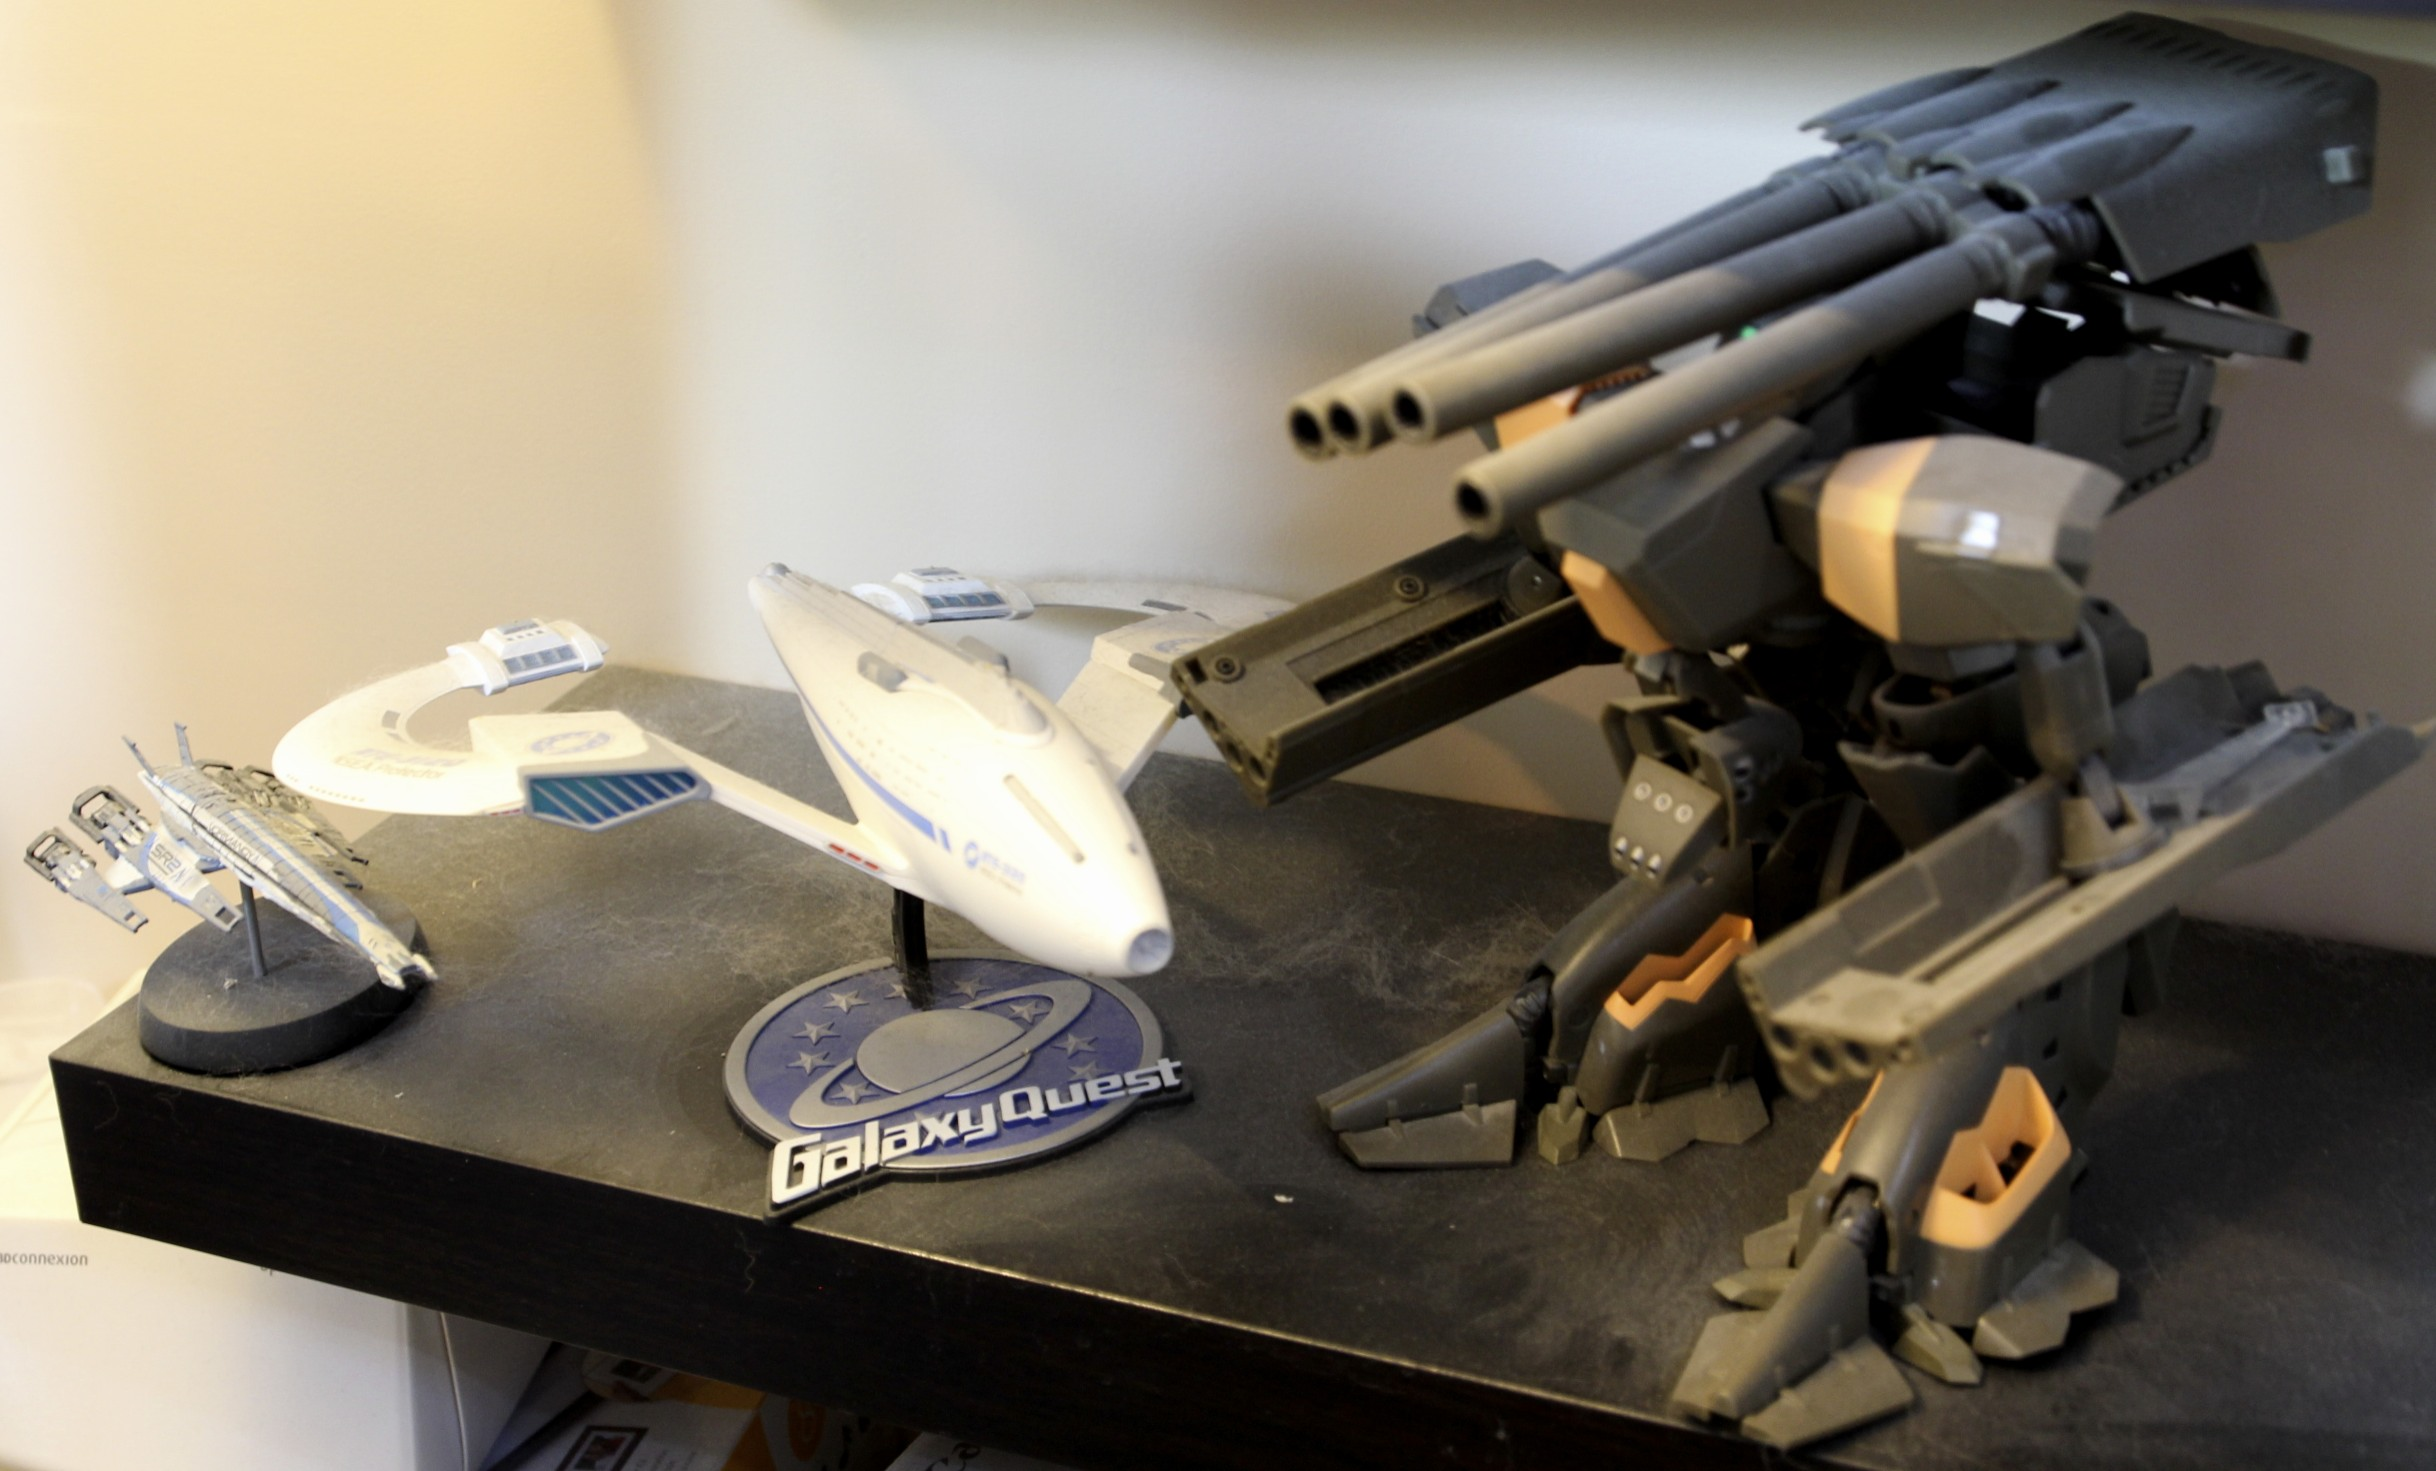 Mass Effect SSVNormandy SR-1, Galaxy Quest NSEA NTE-3120 Protector, Robotech Konig Monster.